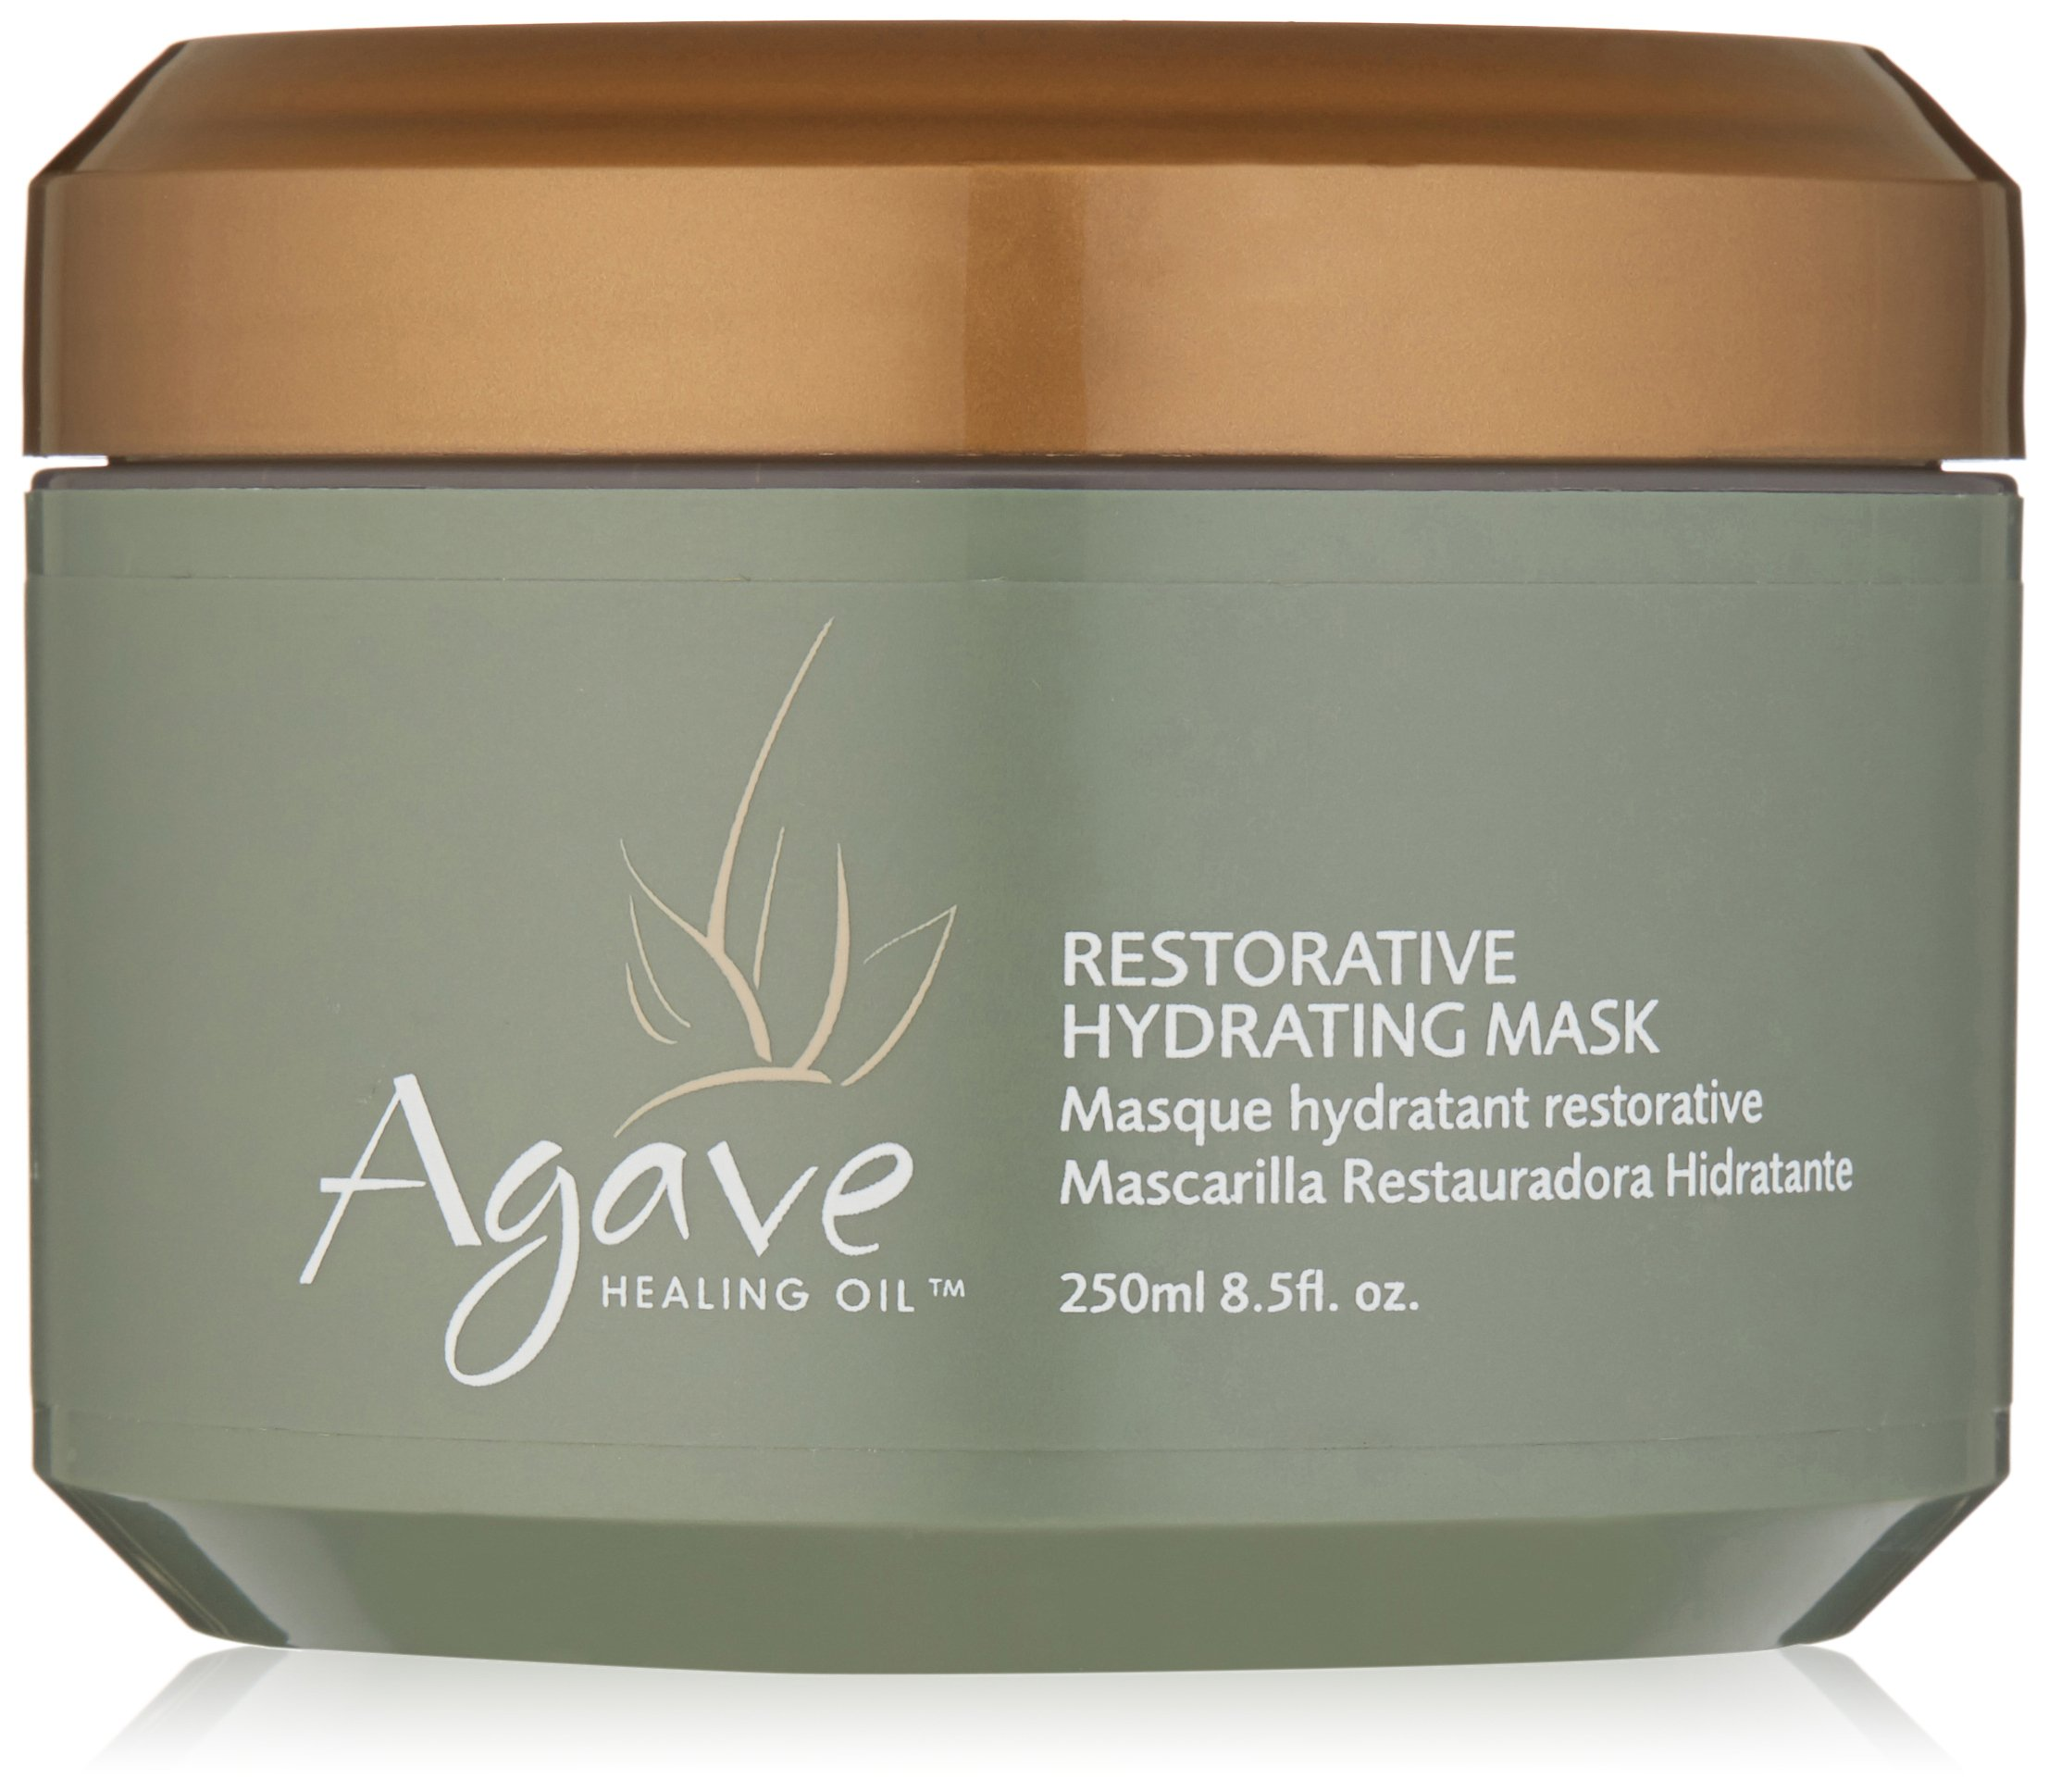 Amazon.com: Agave HEALING OIL Treatment: Luxury Beauty